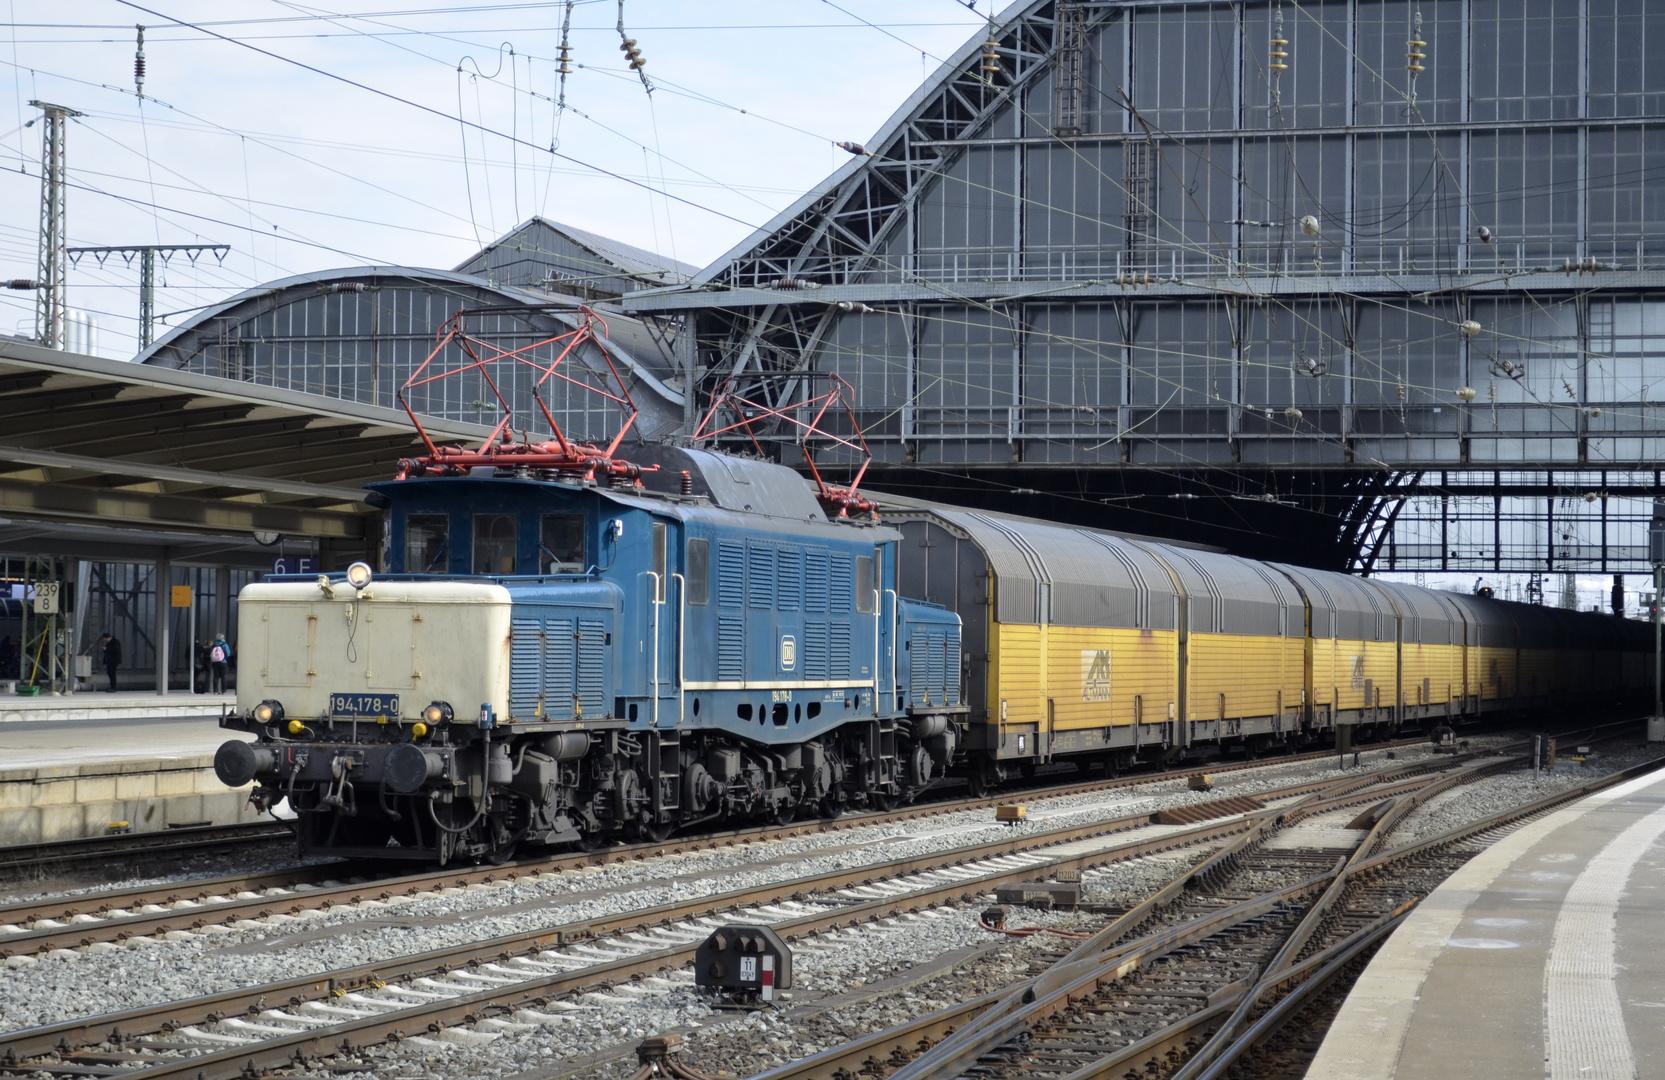 "Baureihe 194 178 ""Krokodil"" in Bremen Hbf"